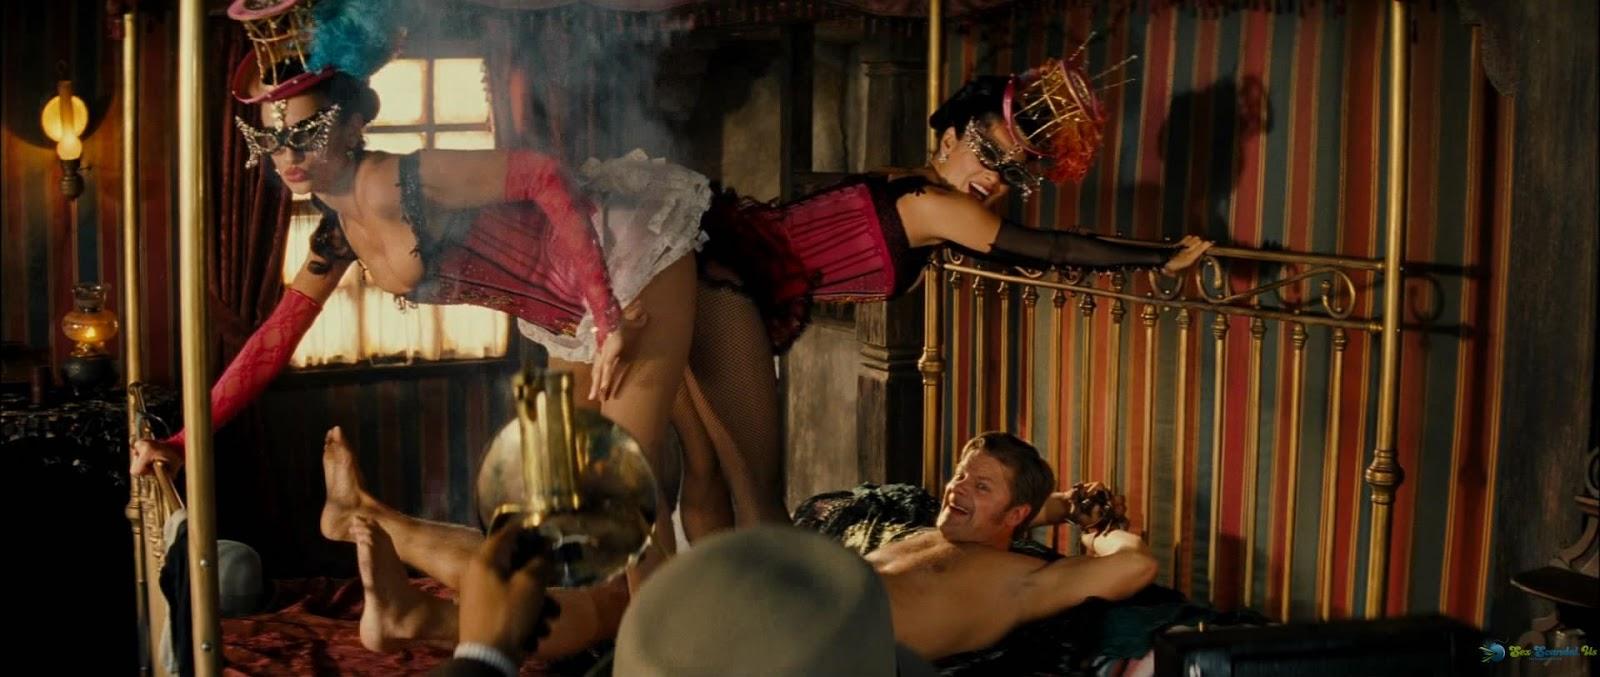 Penelope Cruz - Nude Celebrity, Taiwan Celebrity Sex Scandal, Sex-Scandal.Us, hot sex scandal, nude girls, hot girls, Best Girl, Singapore Scandal, Korean Scandal, Japan Scandal